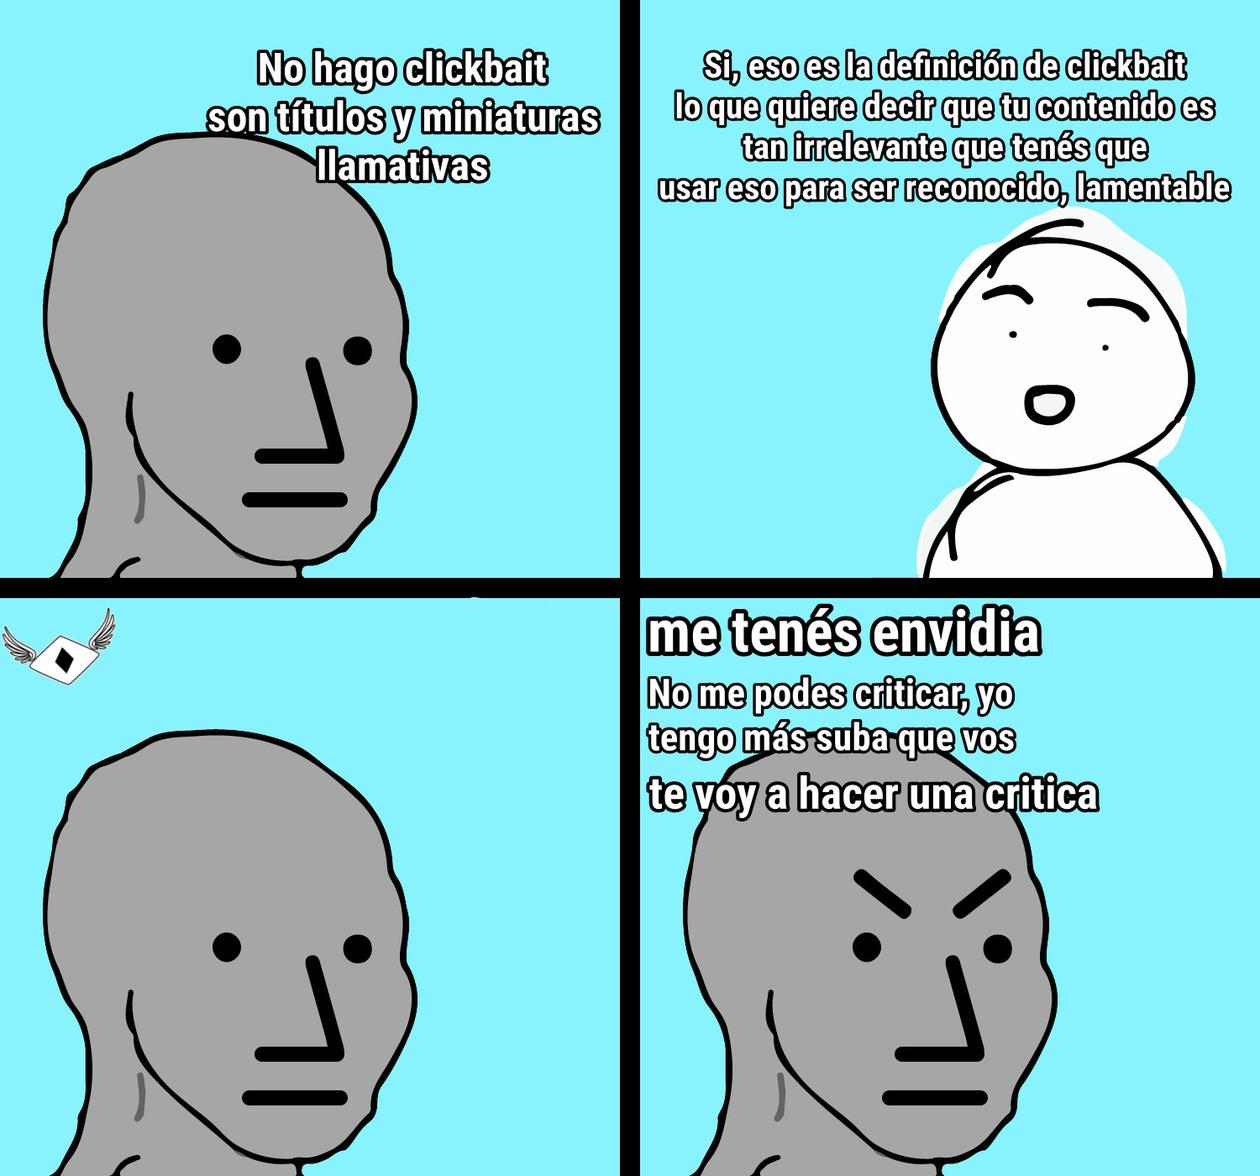 Típico de clickbaiteros - meme